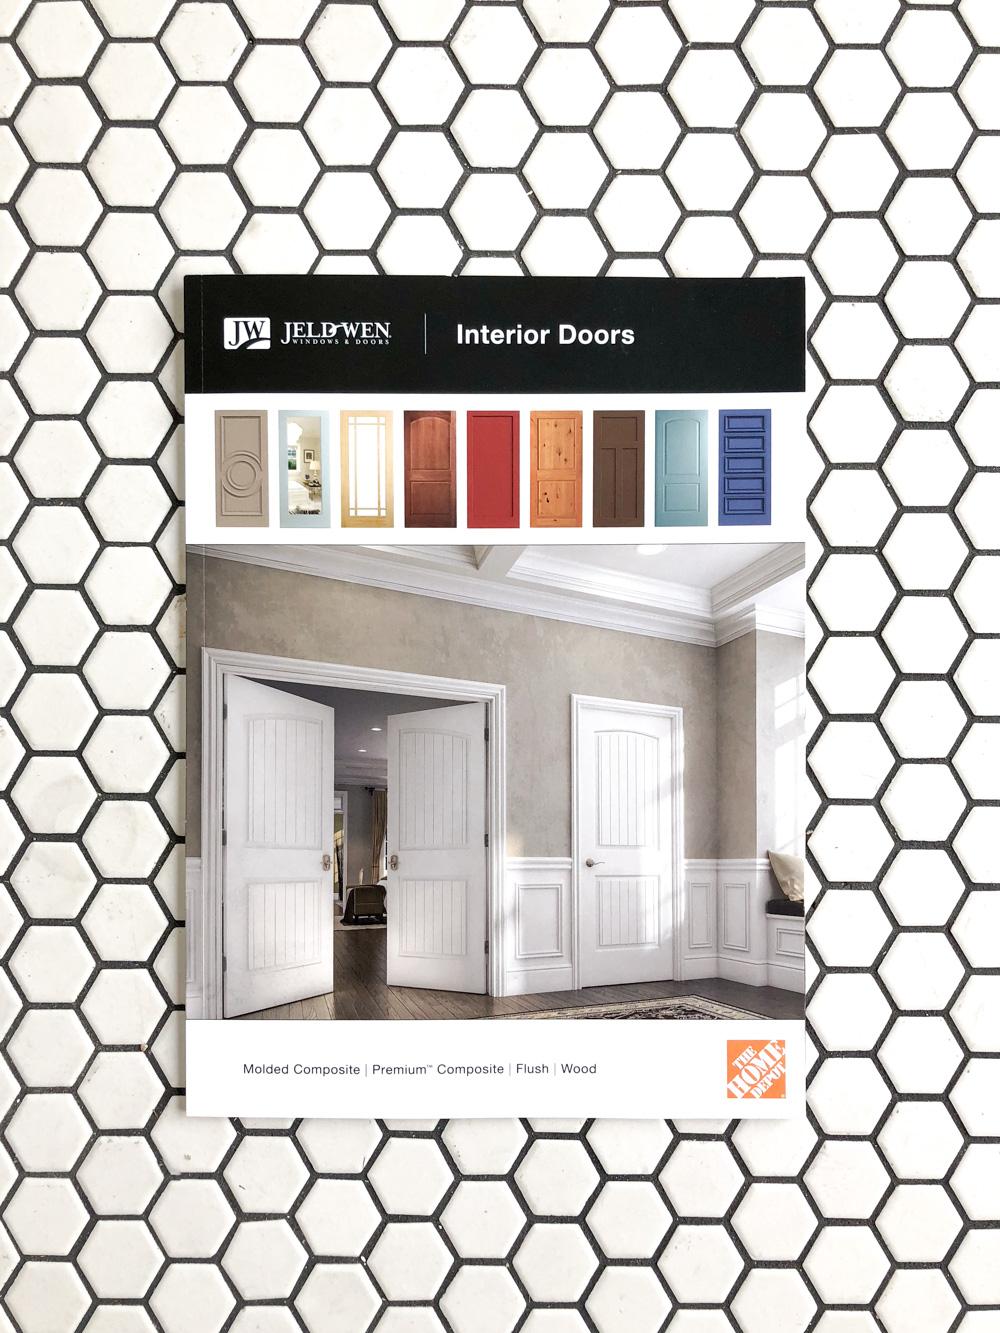 Jeld-Wen Interior Doors from Home Depot Catalog